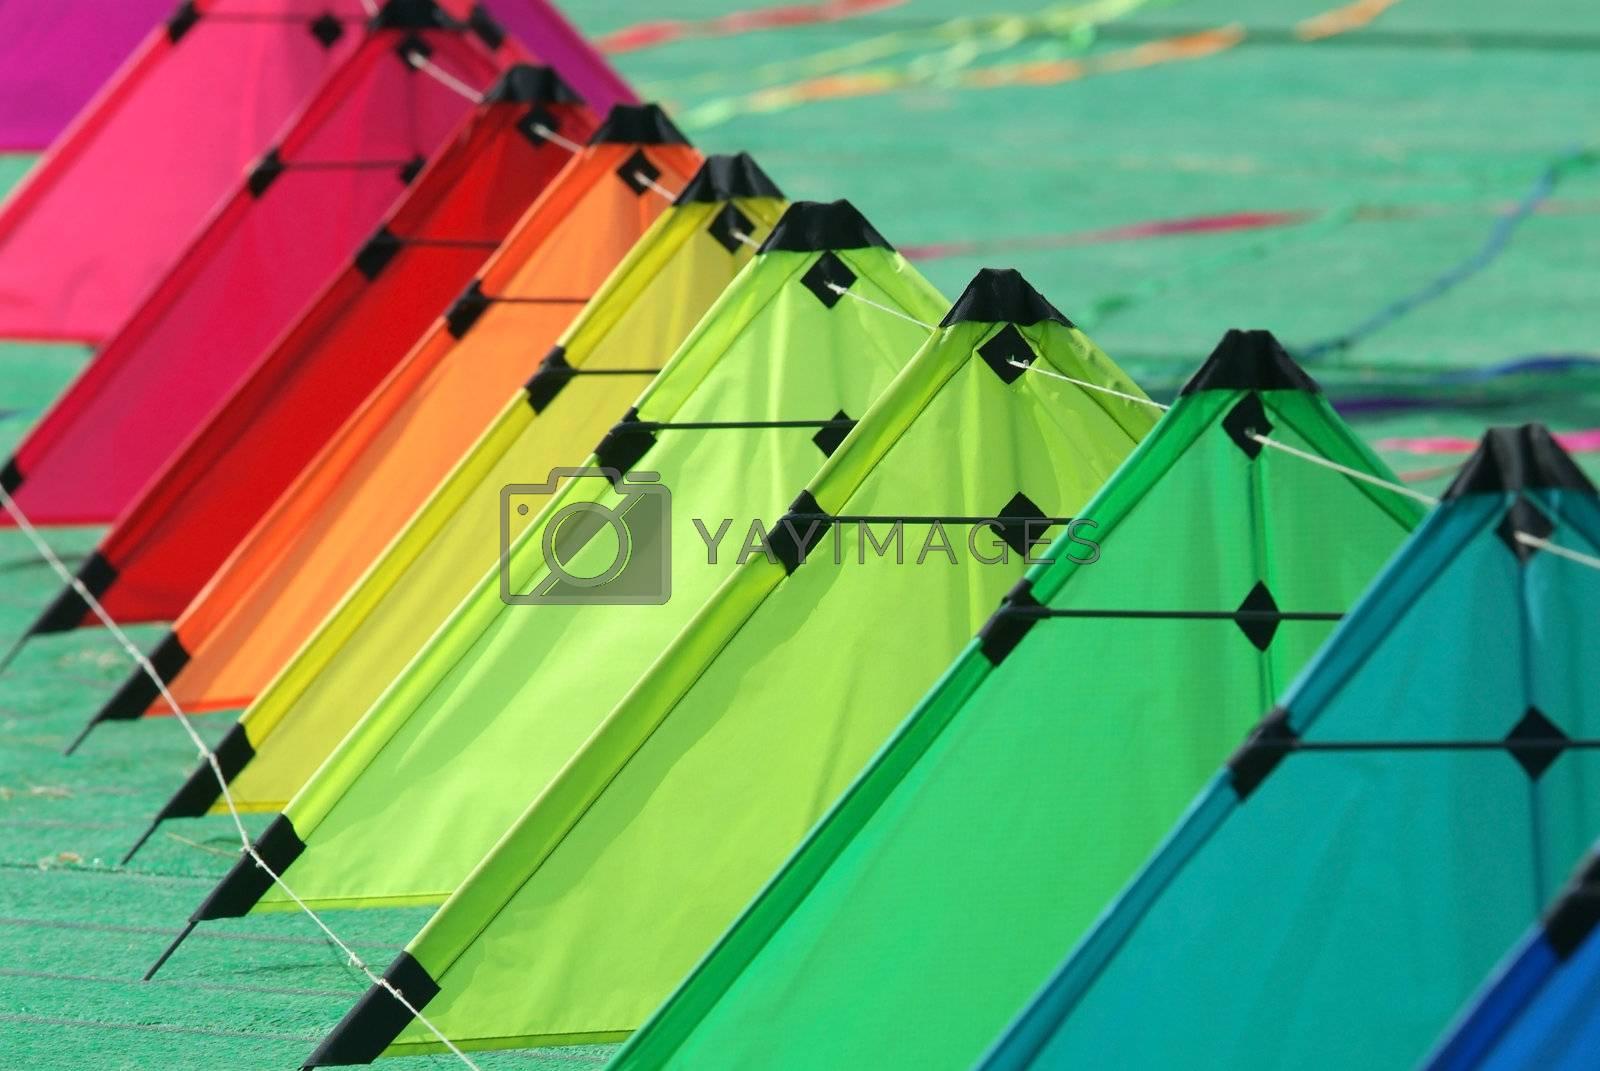 Kites on the ground by epixx